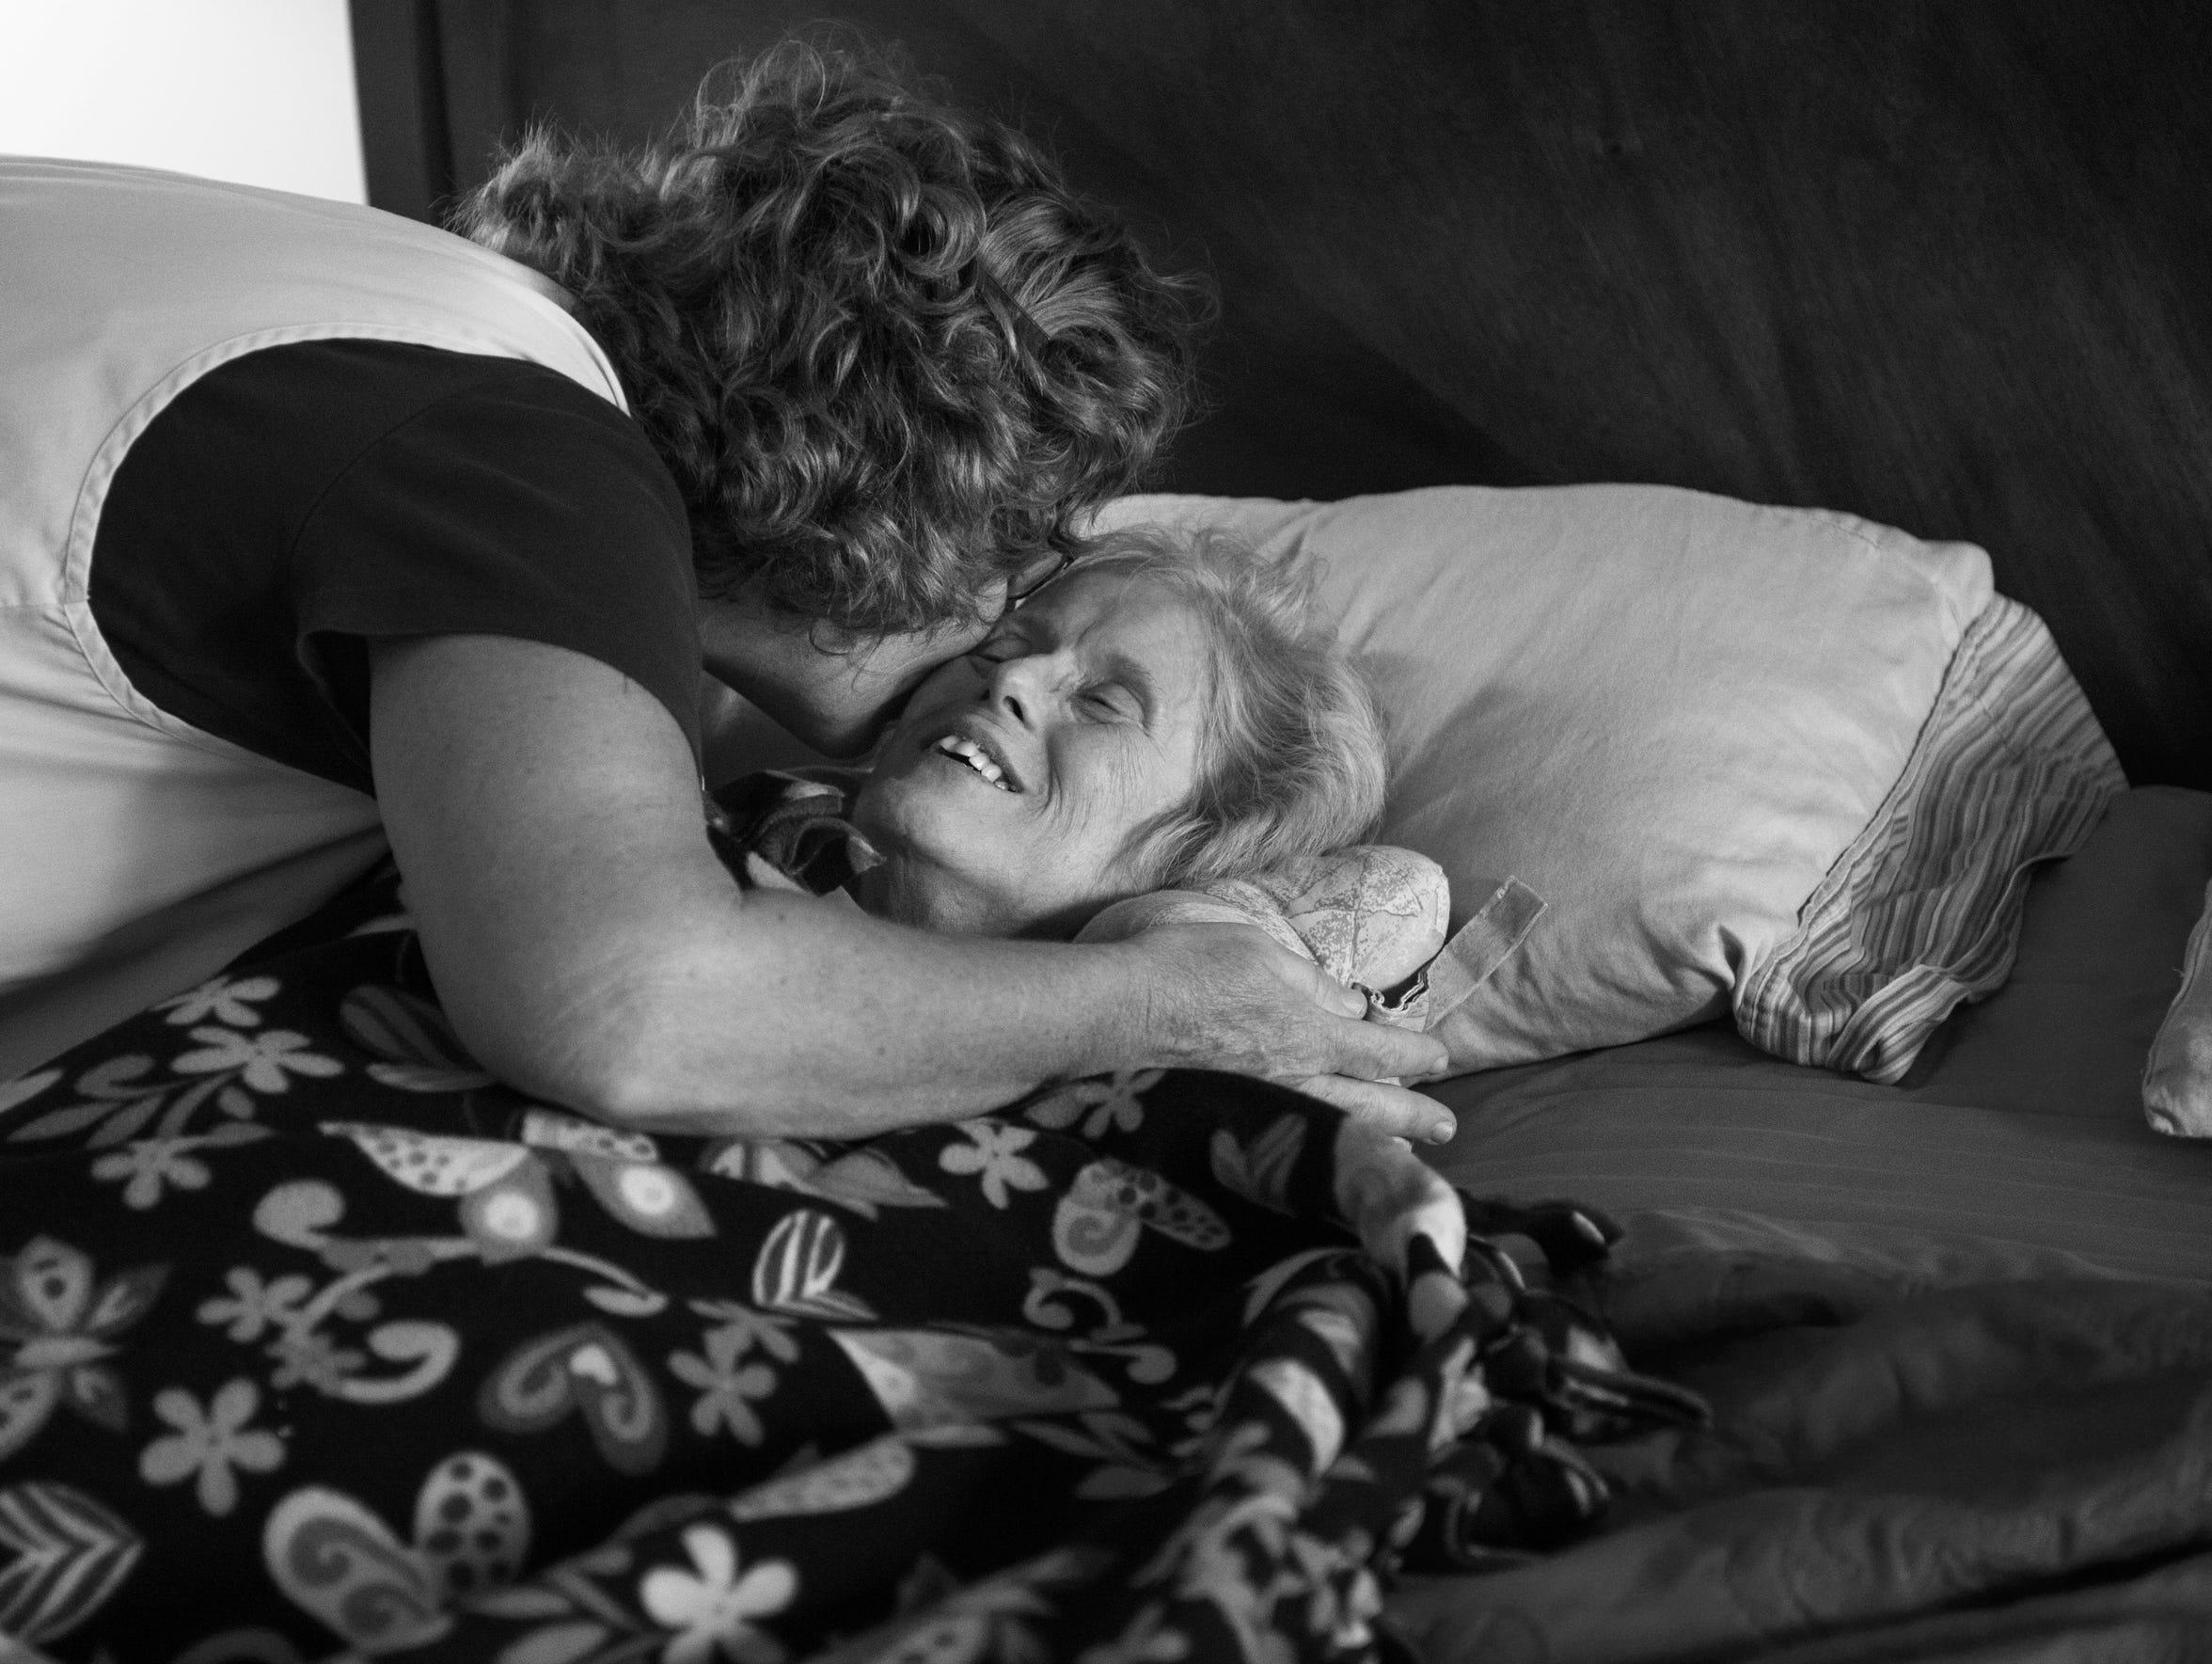 Deaconess VNA hospice nurse Sharon Stoltz hugs and